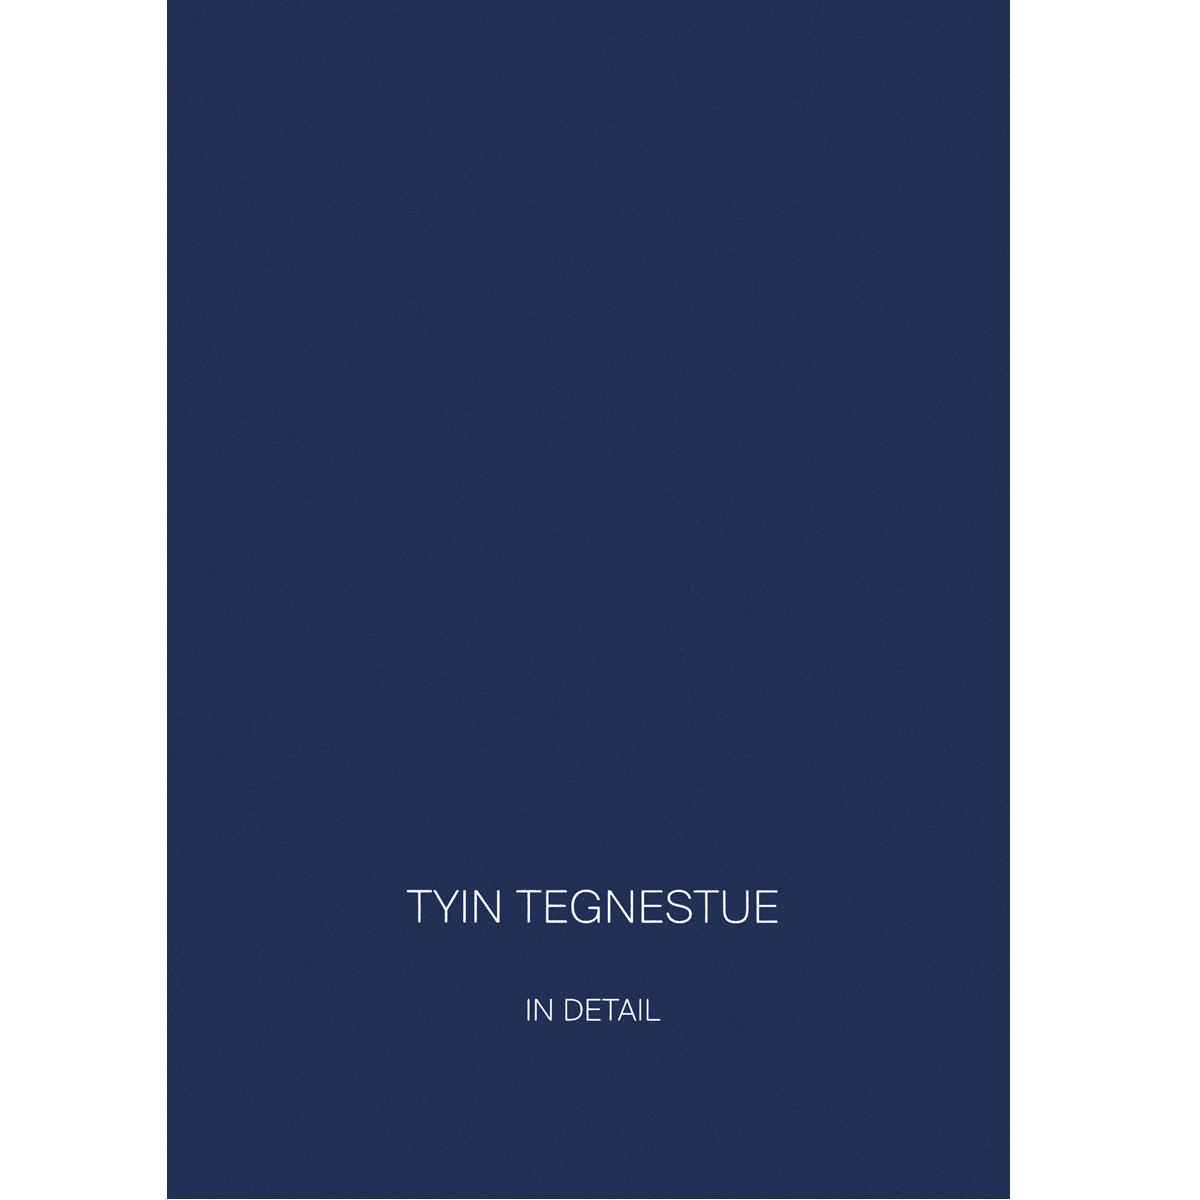 TYIN tegnestue: in detail